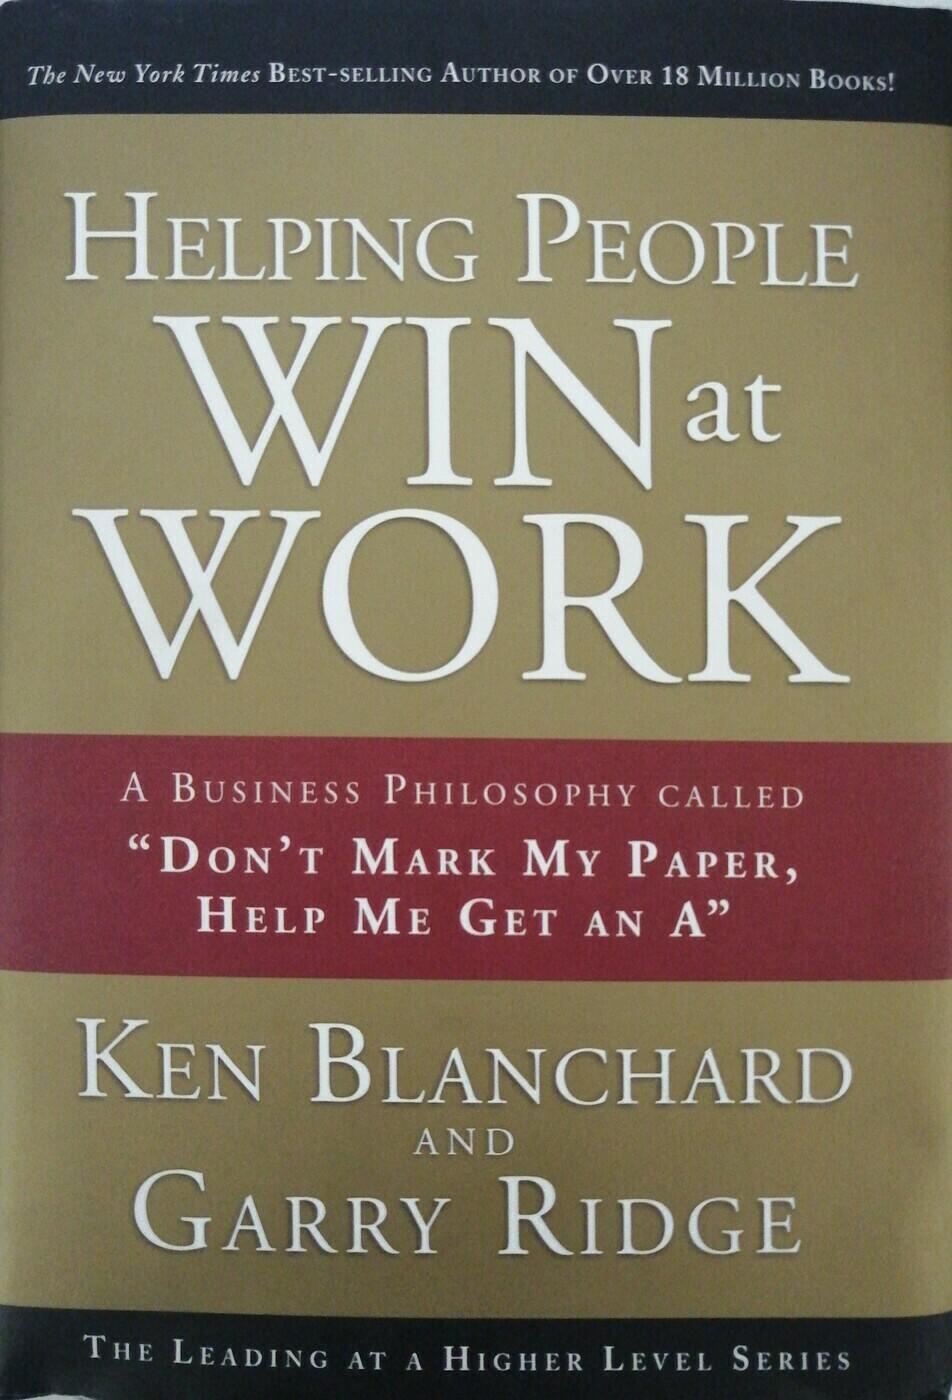 Helping People Win at Work: A Business Philosophy Called Dont Mark My Paper, Help Me Get an A; Ridge Gary, Blanchard Ken, Ridge Garry